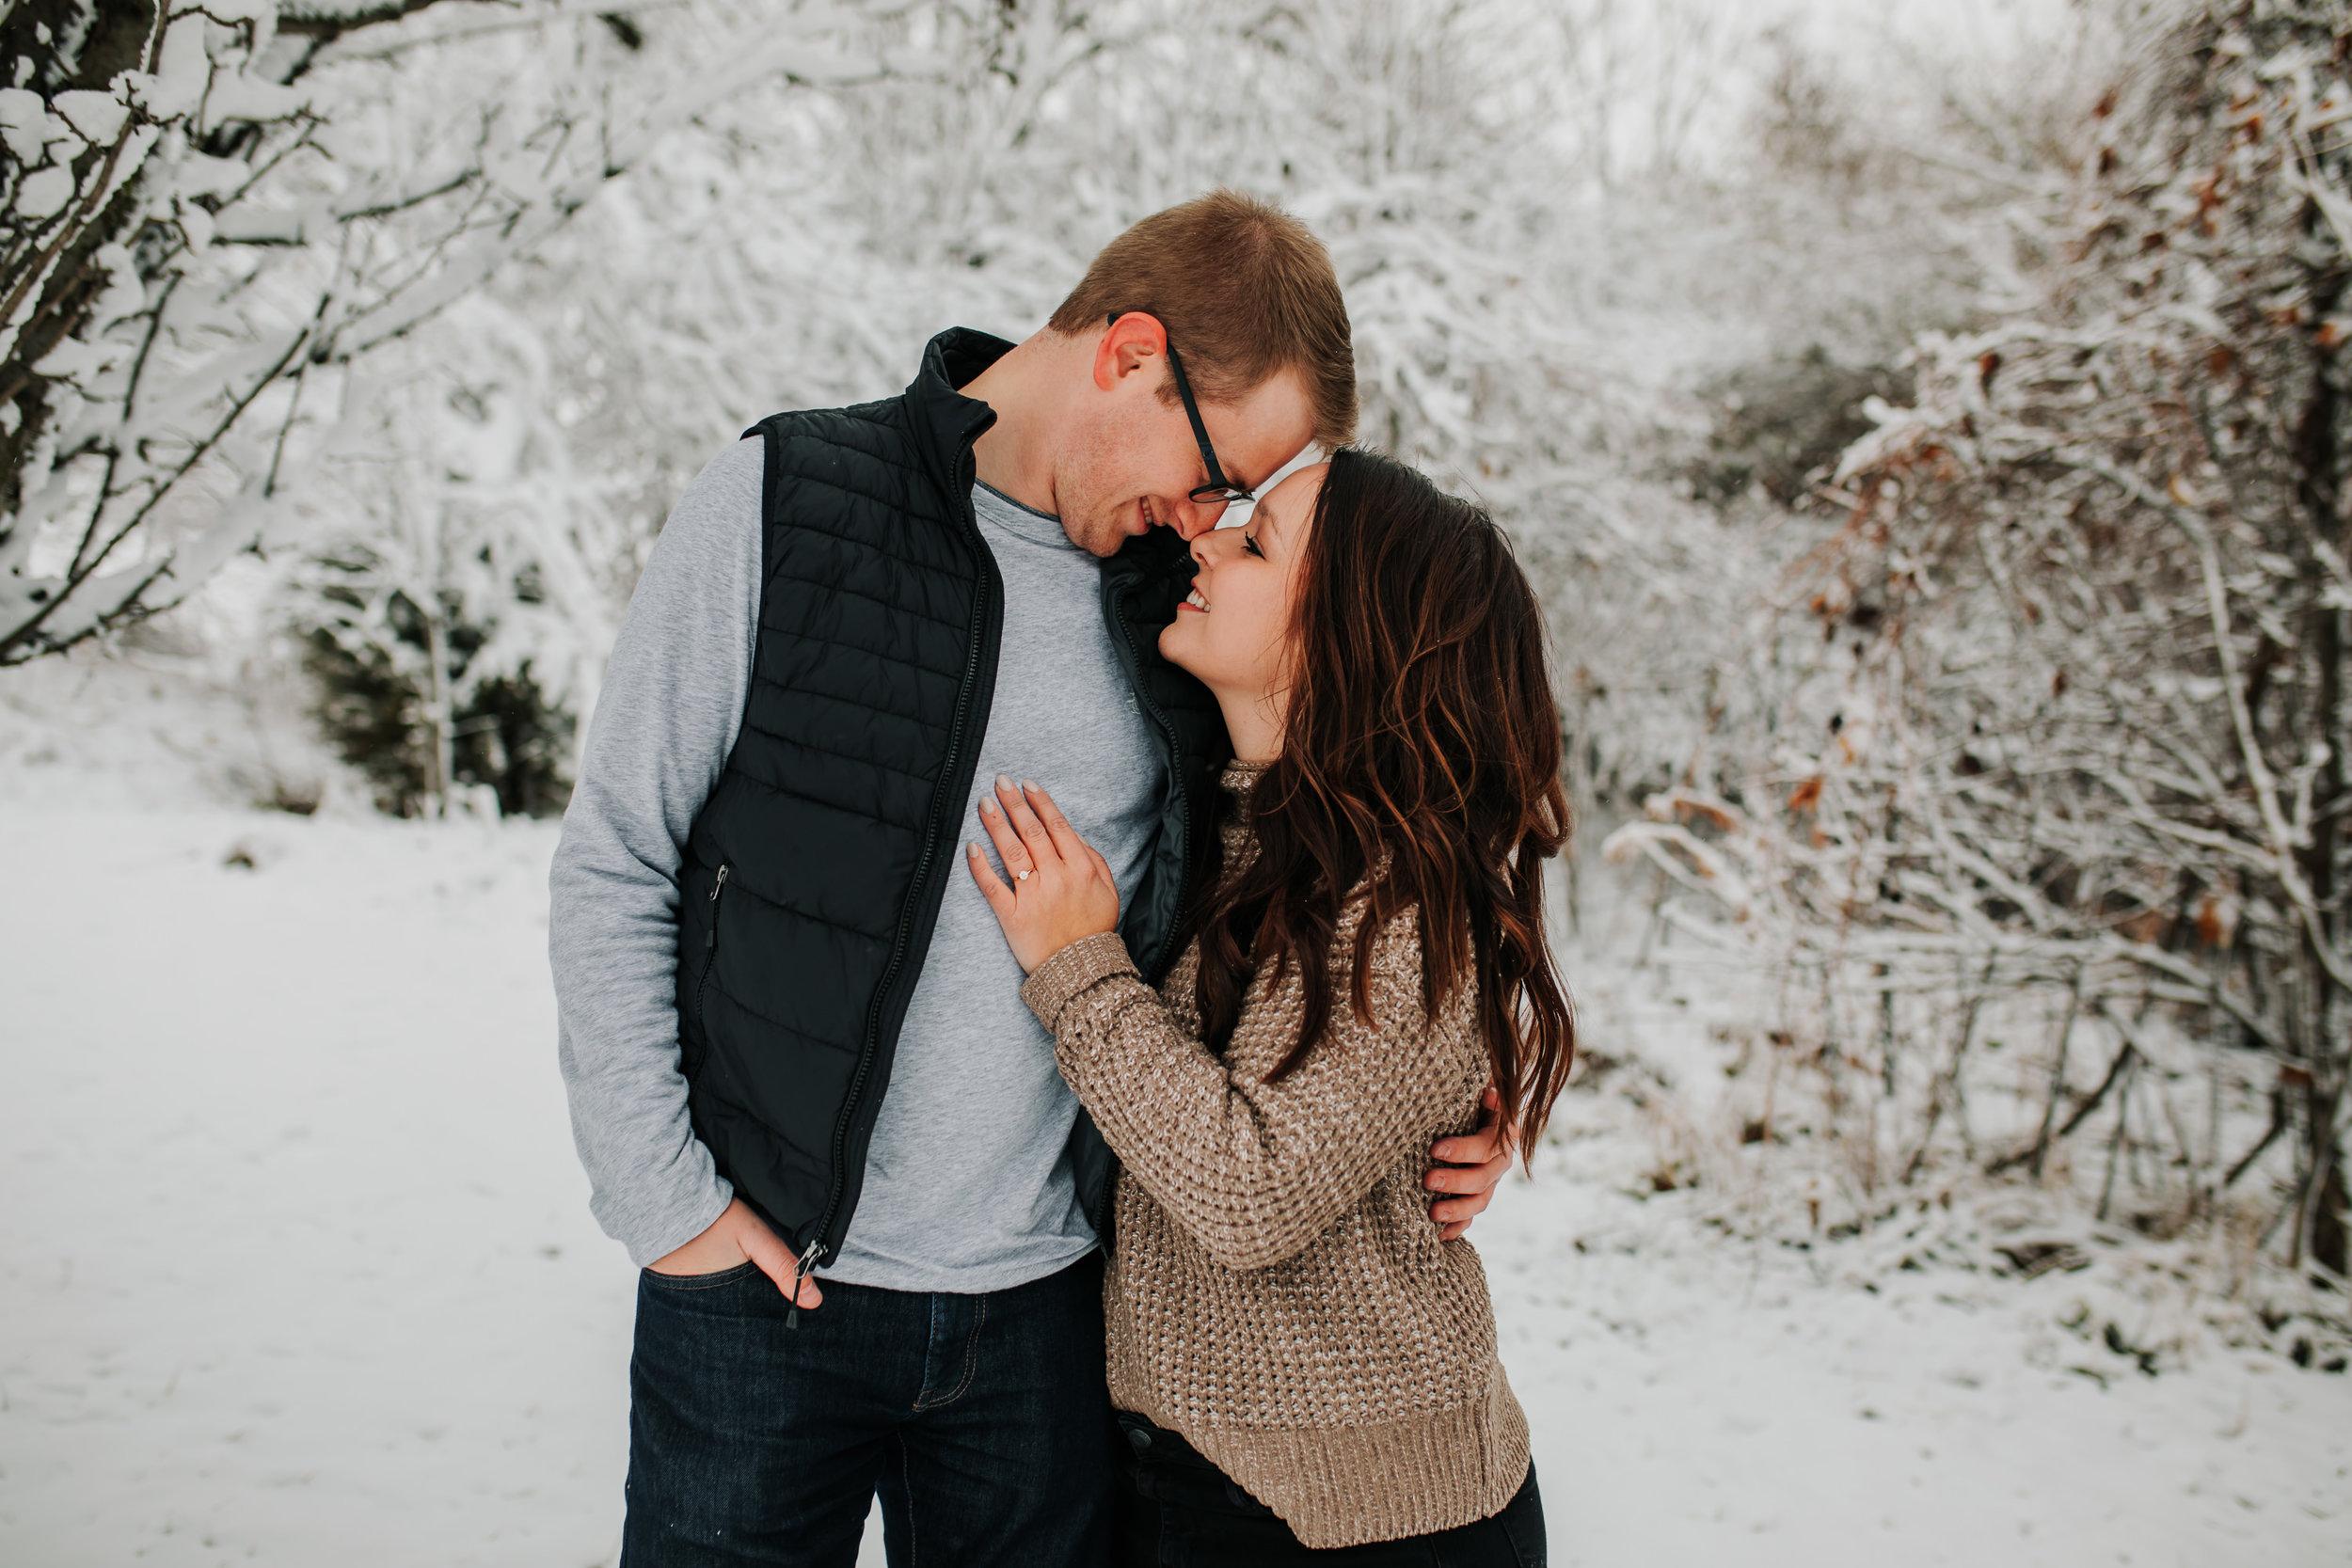 Vanessa & Dan - Engaged - Nathaniel Jensen Photography - Omaha Nebraska Wedding Photographer - Standing Bear Lake - Snowy Engagement Session-16.jpg